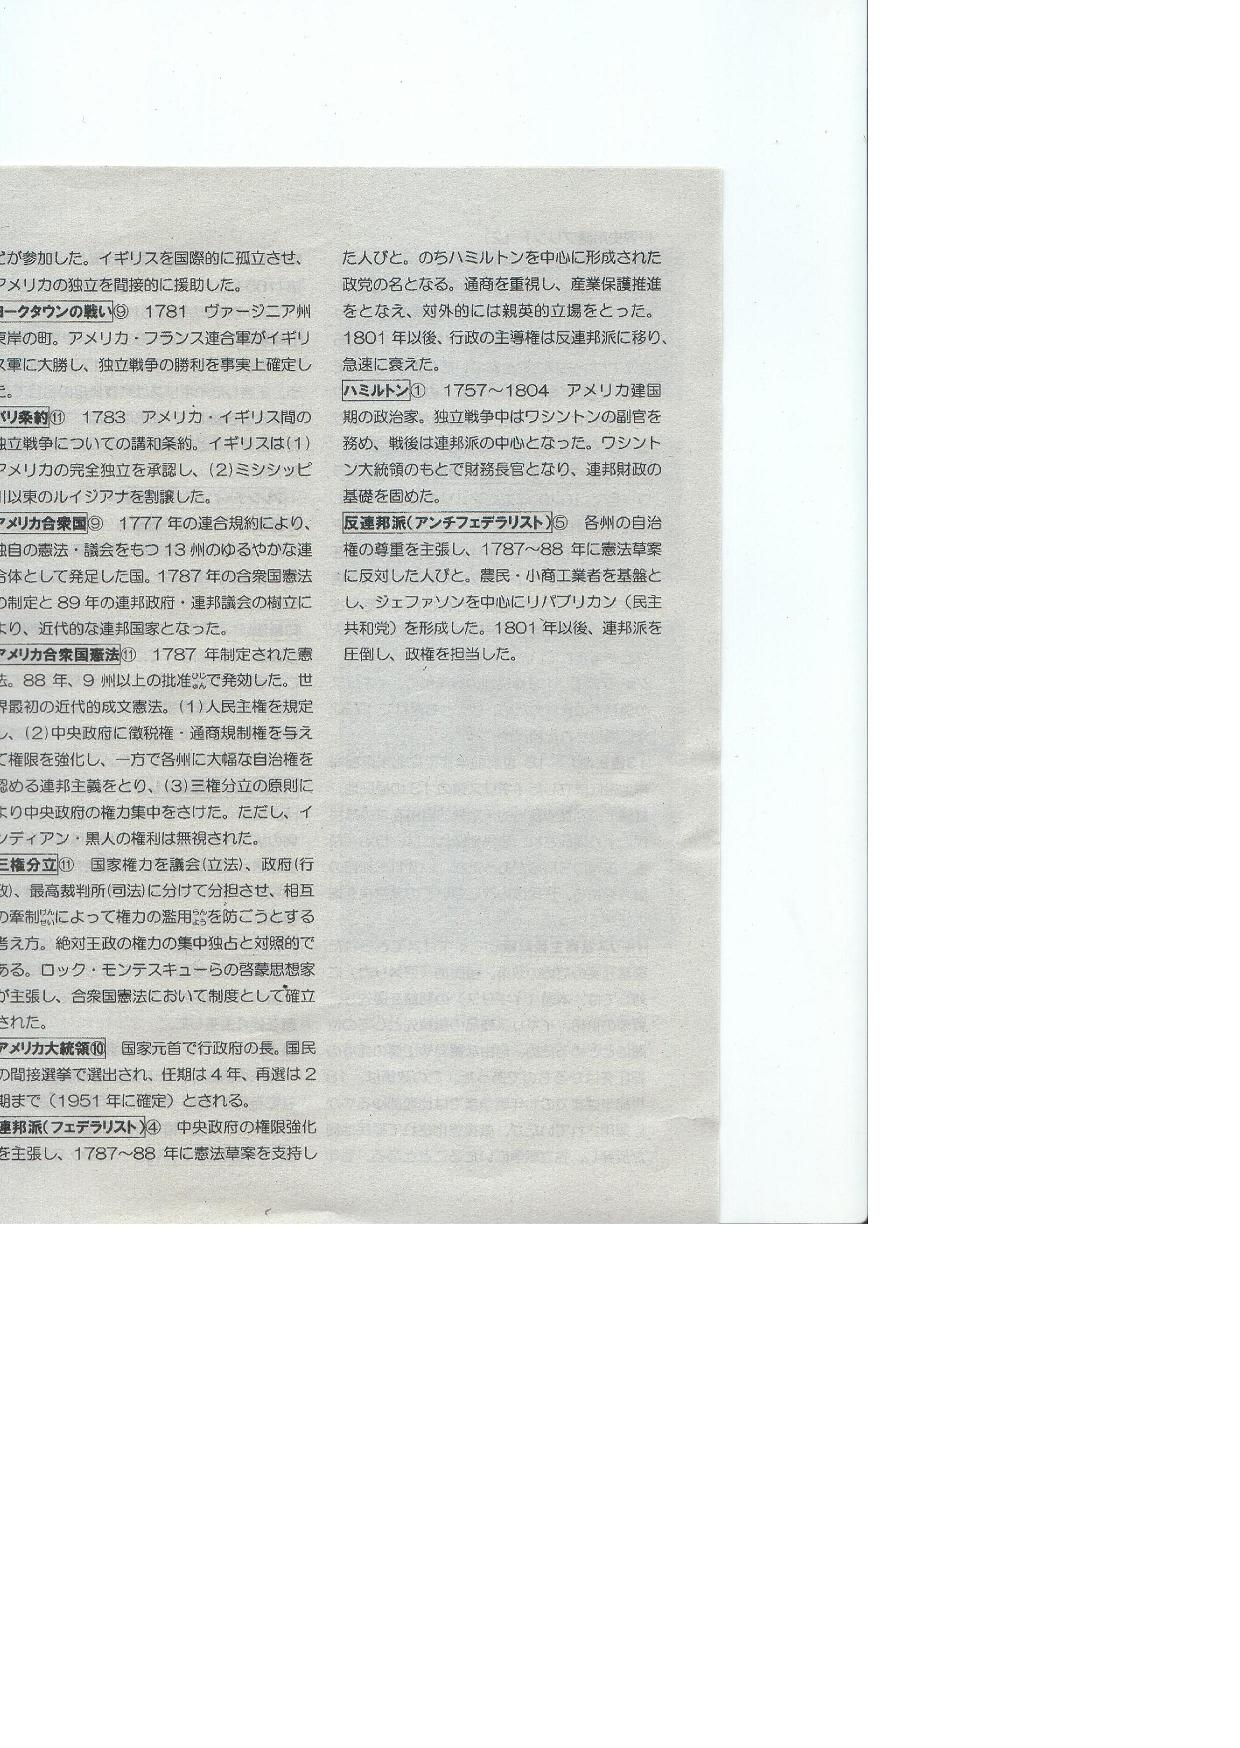 SAVE0156.jpg